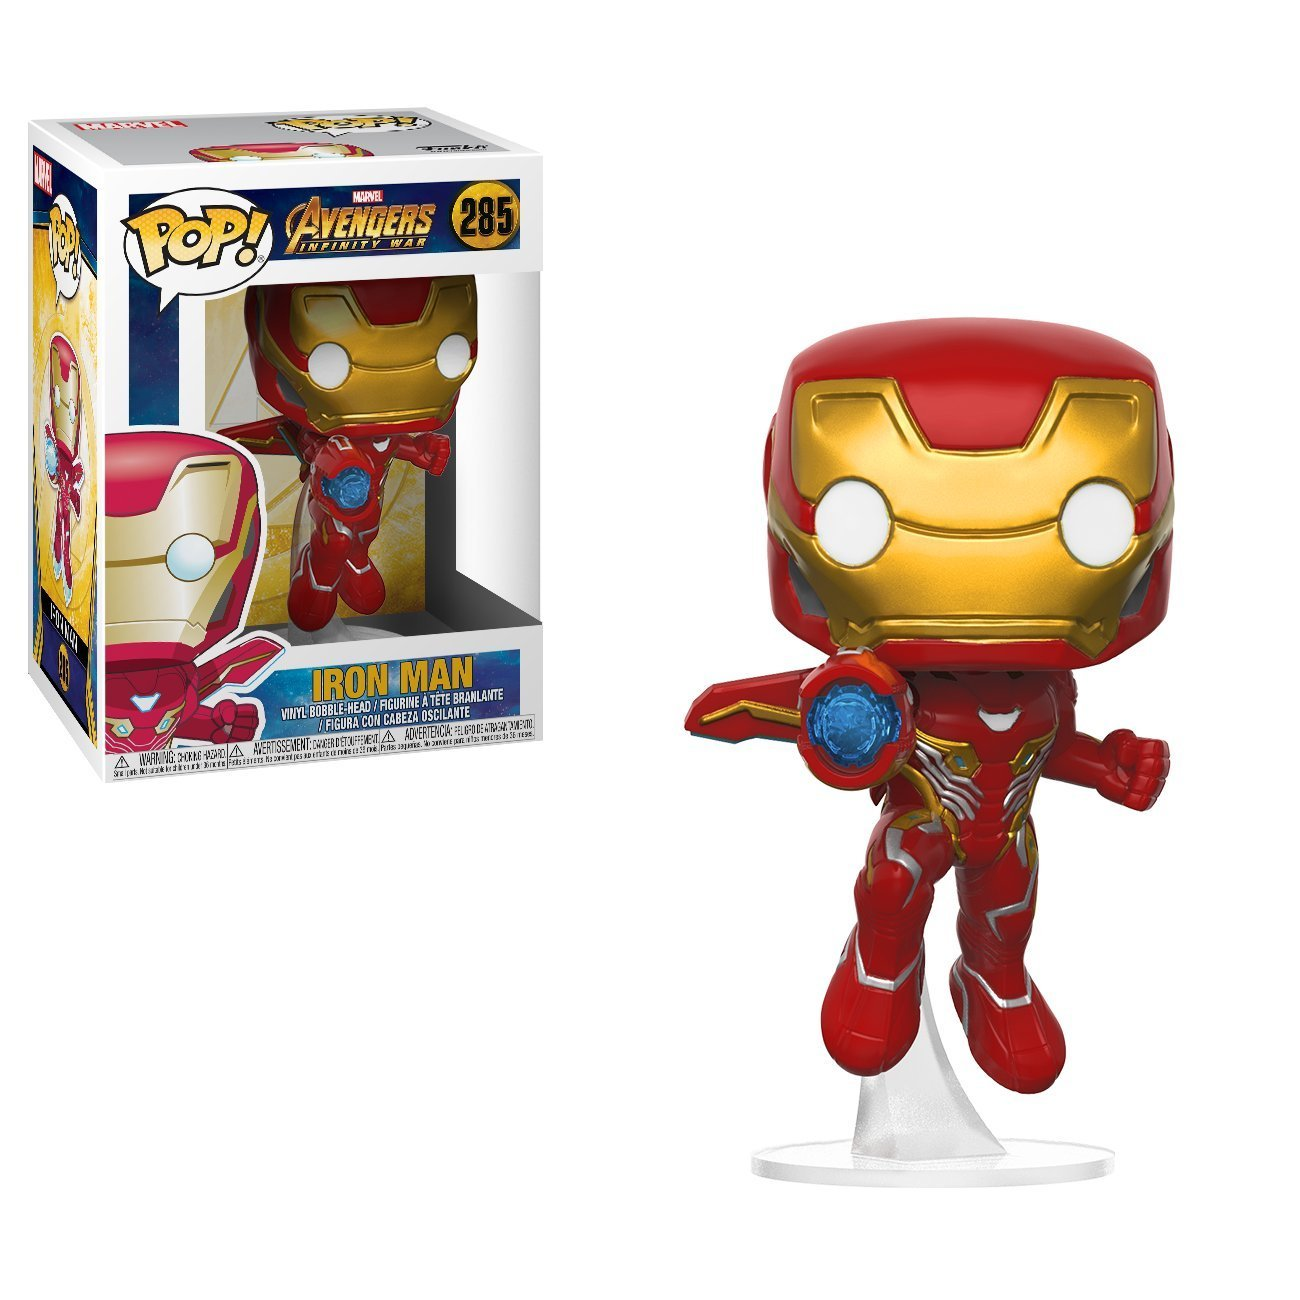 Pop! - Marvel: Iron Man Avengers Infinity War imagen